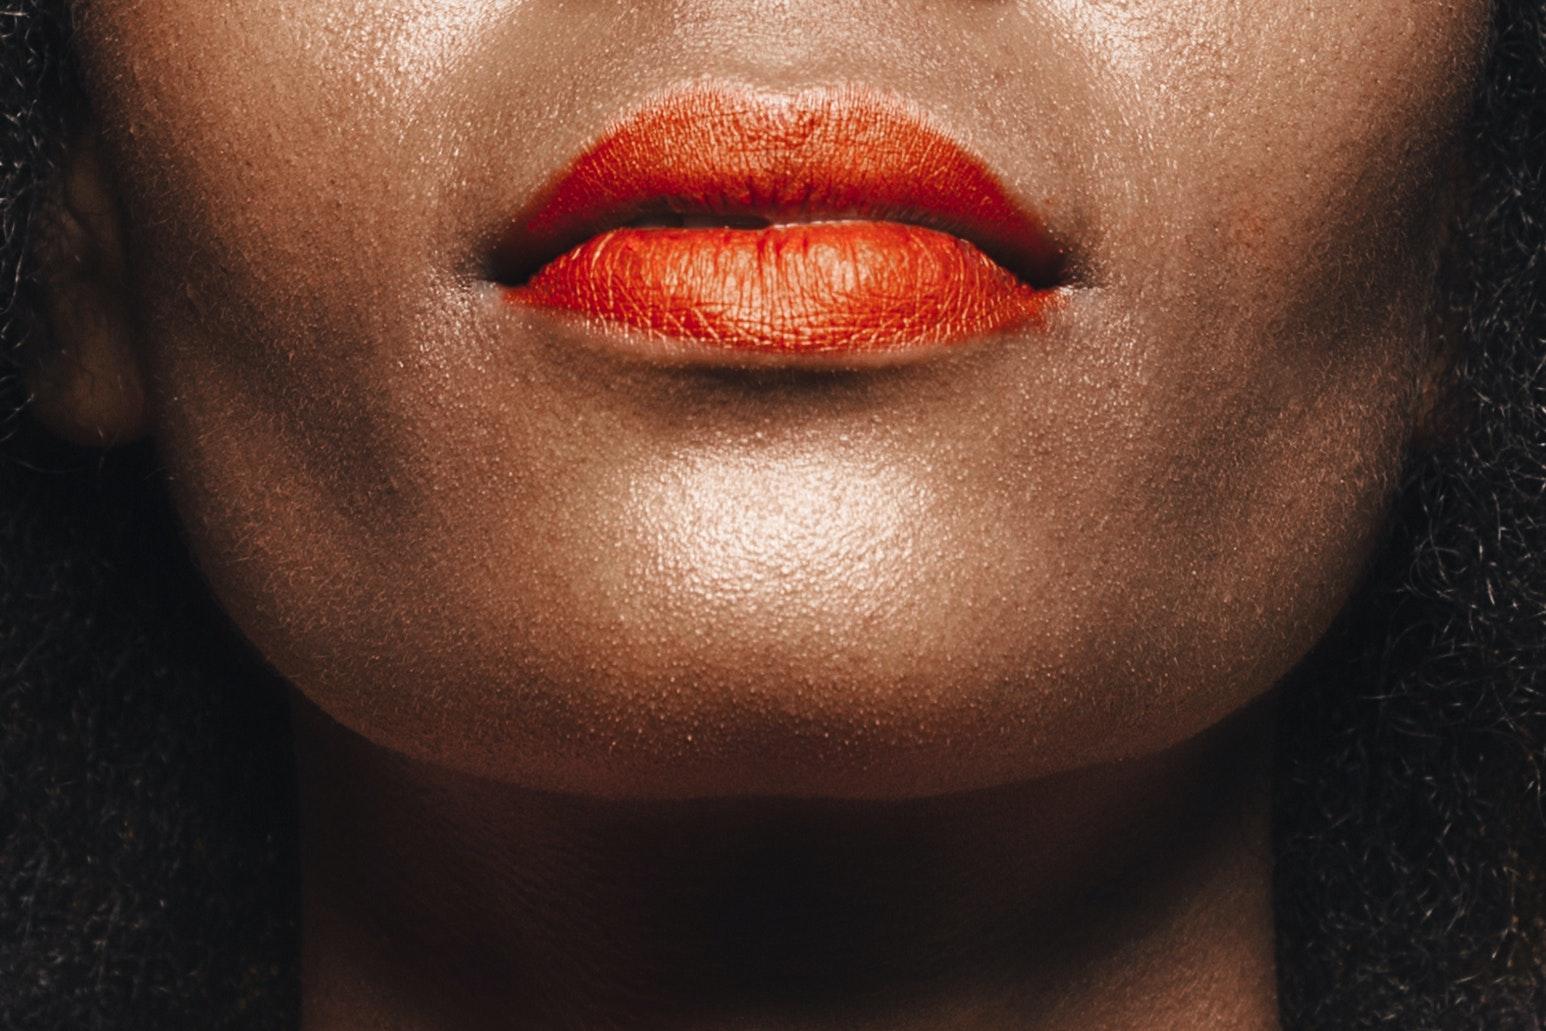 How to Help Fade Post-Inflammatory Hyperpigmentation ASAP